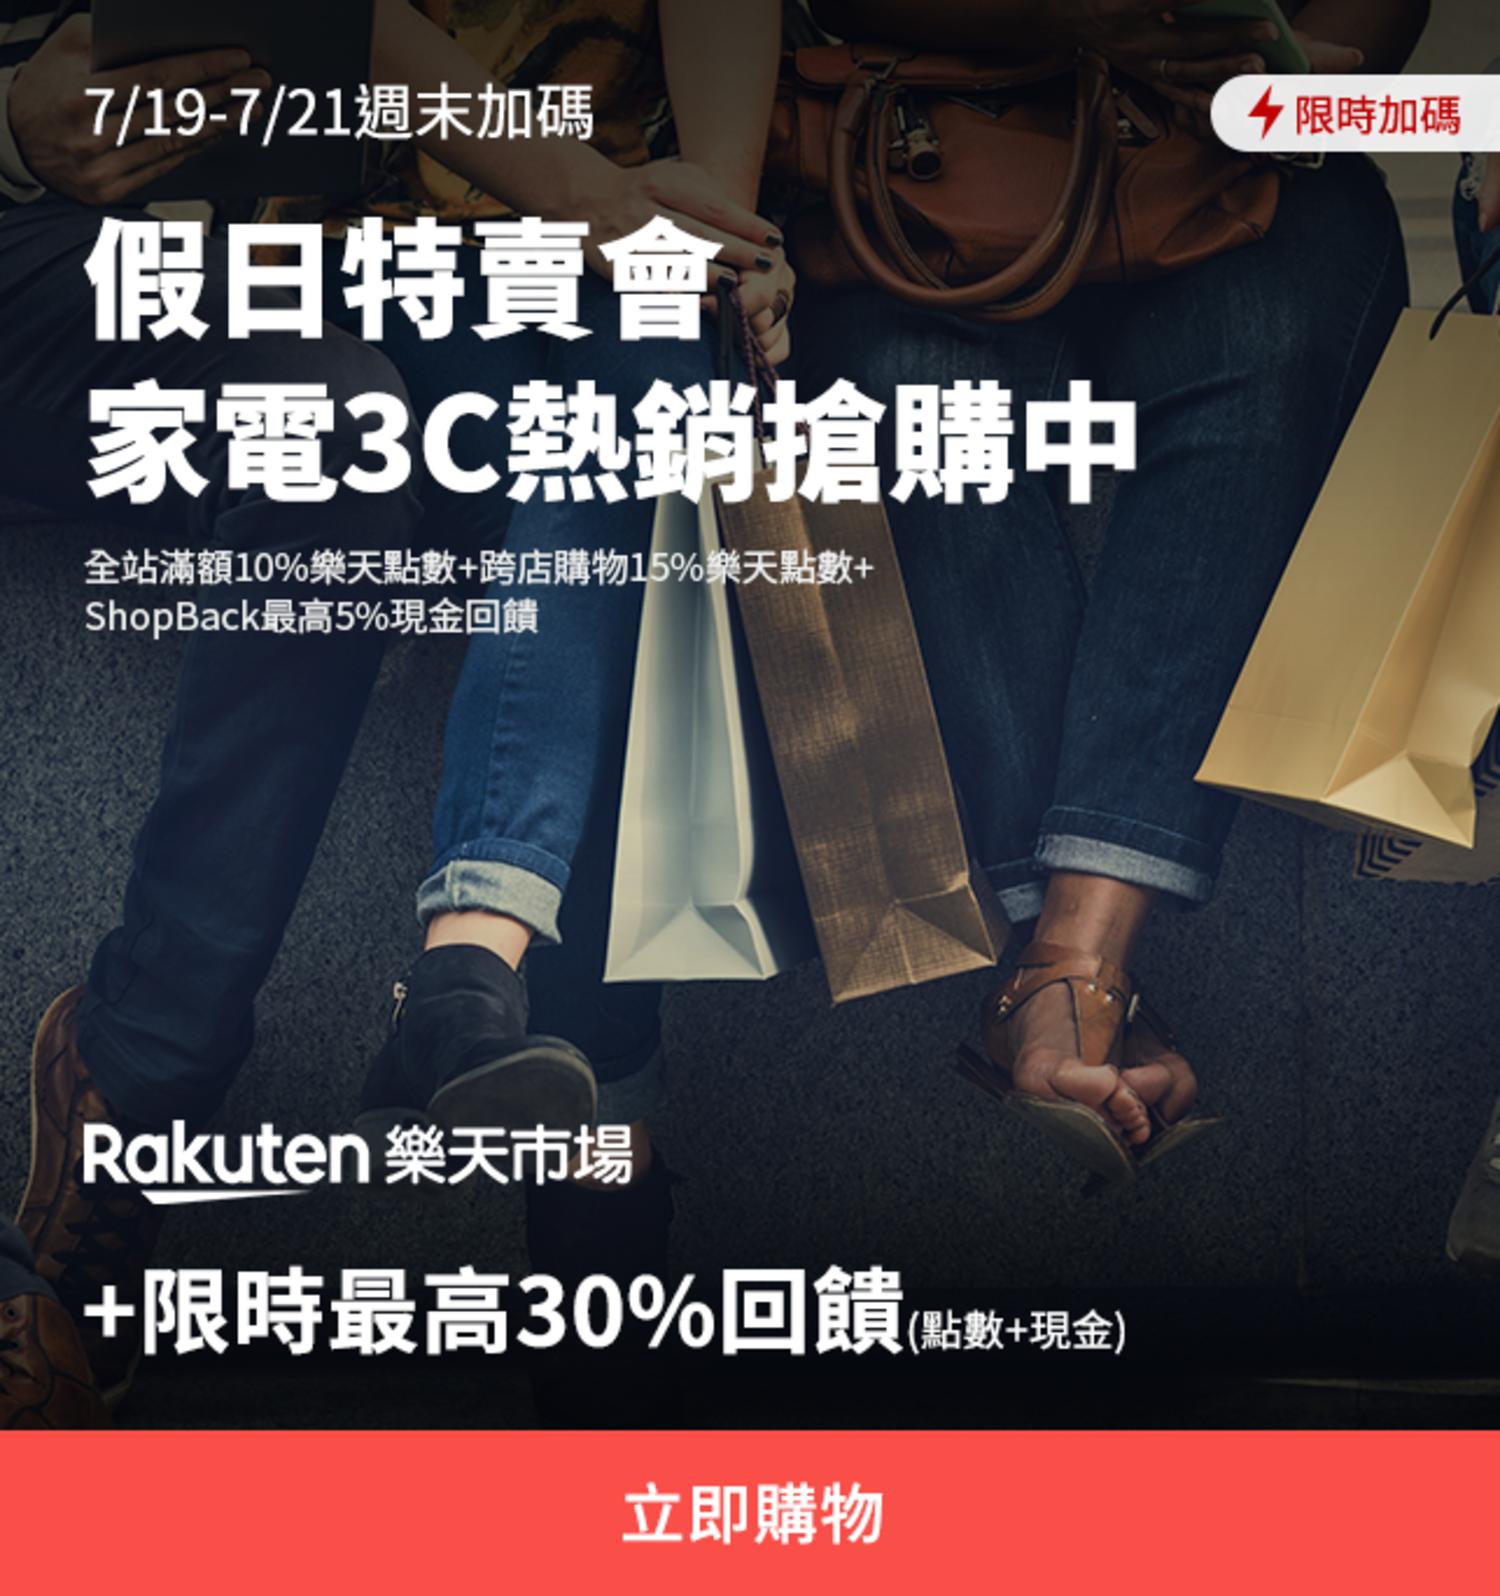 Rakuten假日特賣會+加碼7/19-7/21